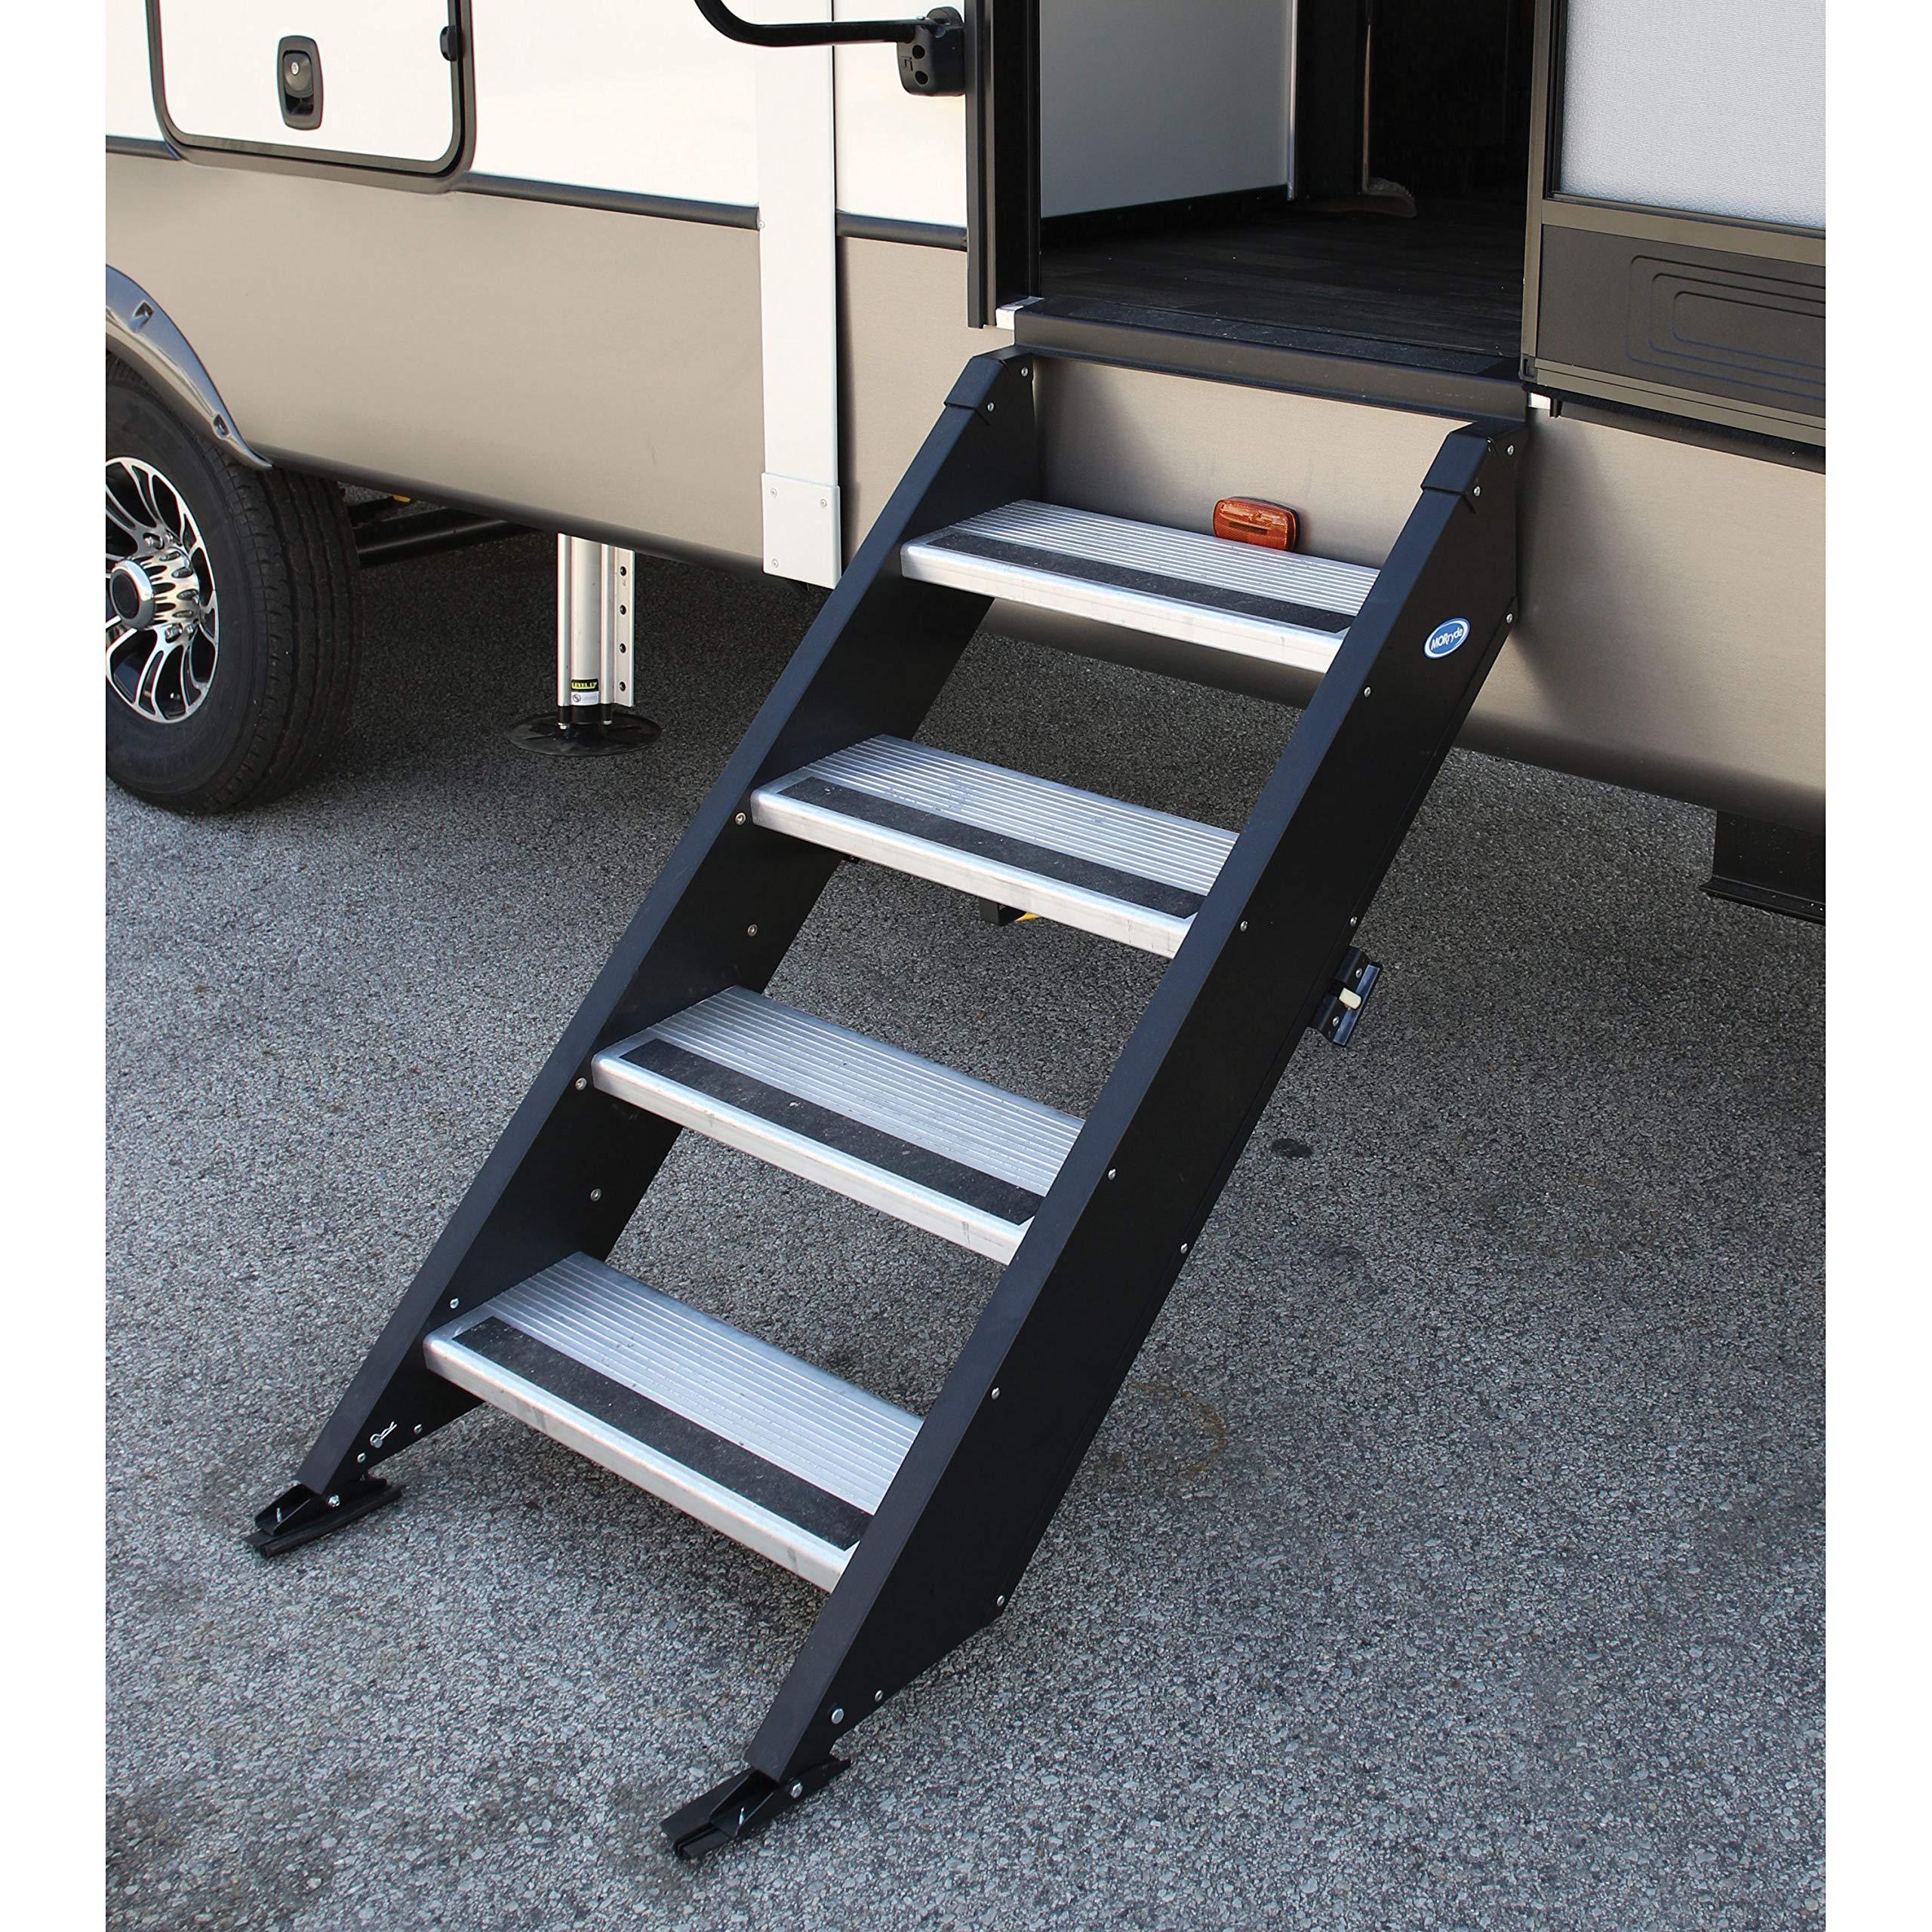 MOR/ryde International STP-4-30-03H Fold 4 Step 30'' Door